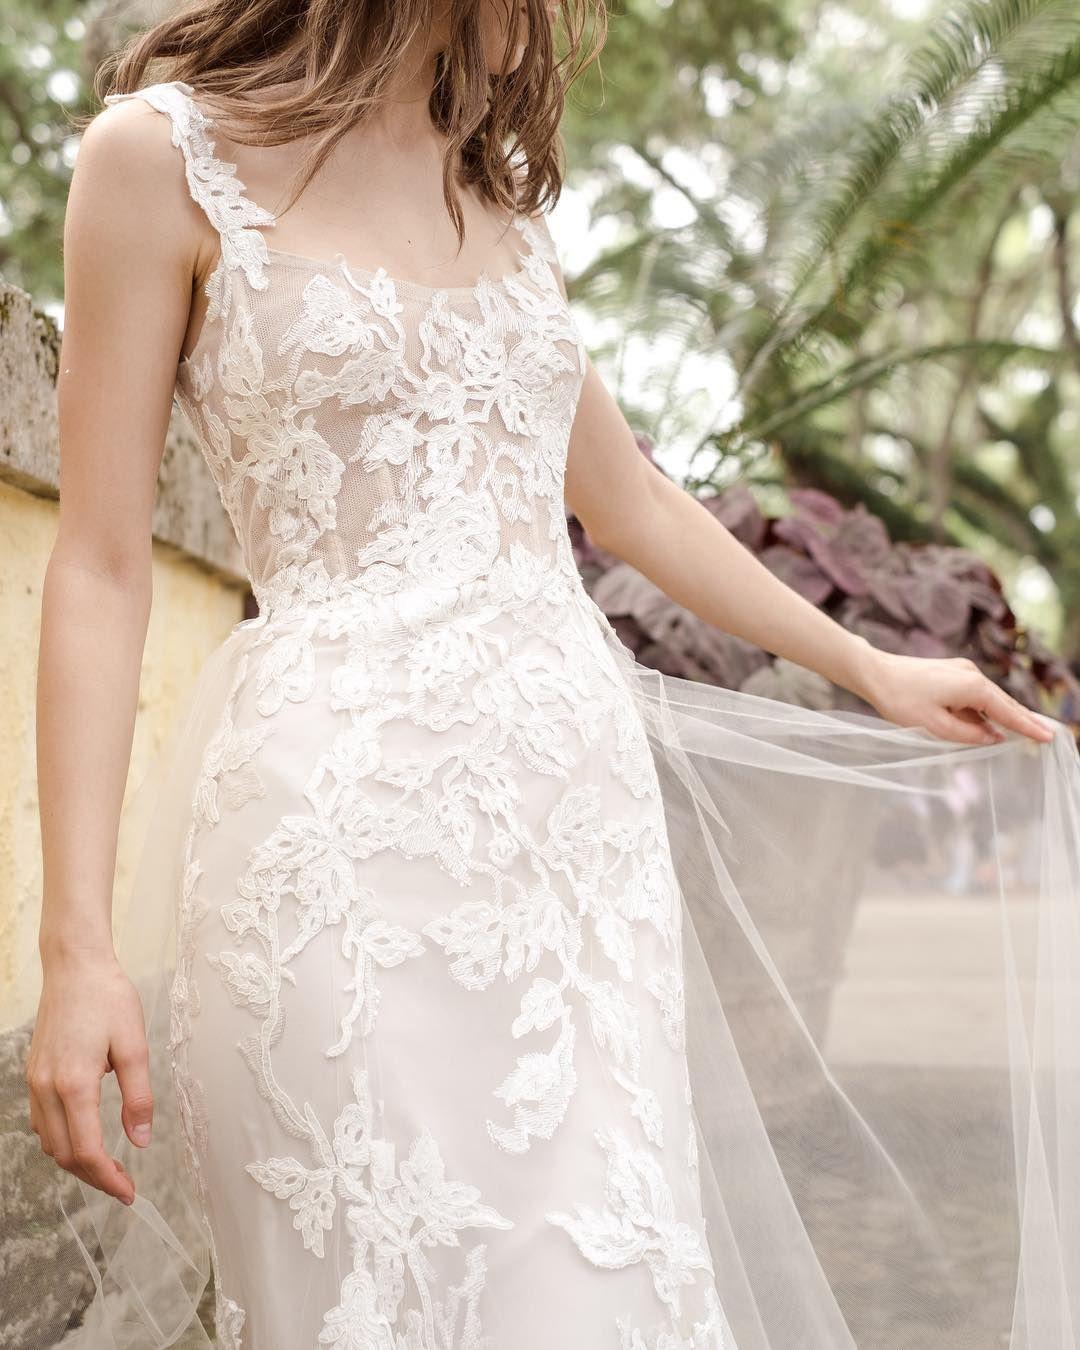 Monique Lhuillier Bride On Instagram Only A Few Appointments Left Last Chance To Shop Th Bohemian Wedding Dresses Summer Wedding Gowns Retro Wedding Dresses [ 1350 x 1080 Pixel ]